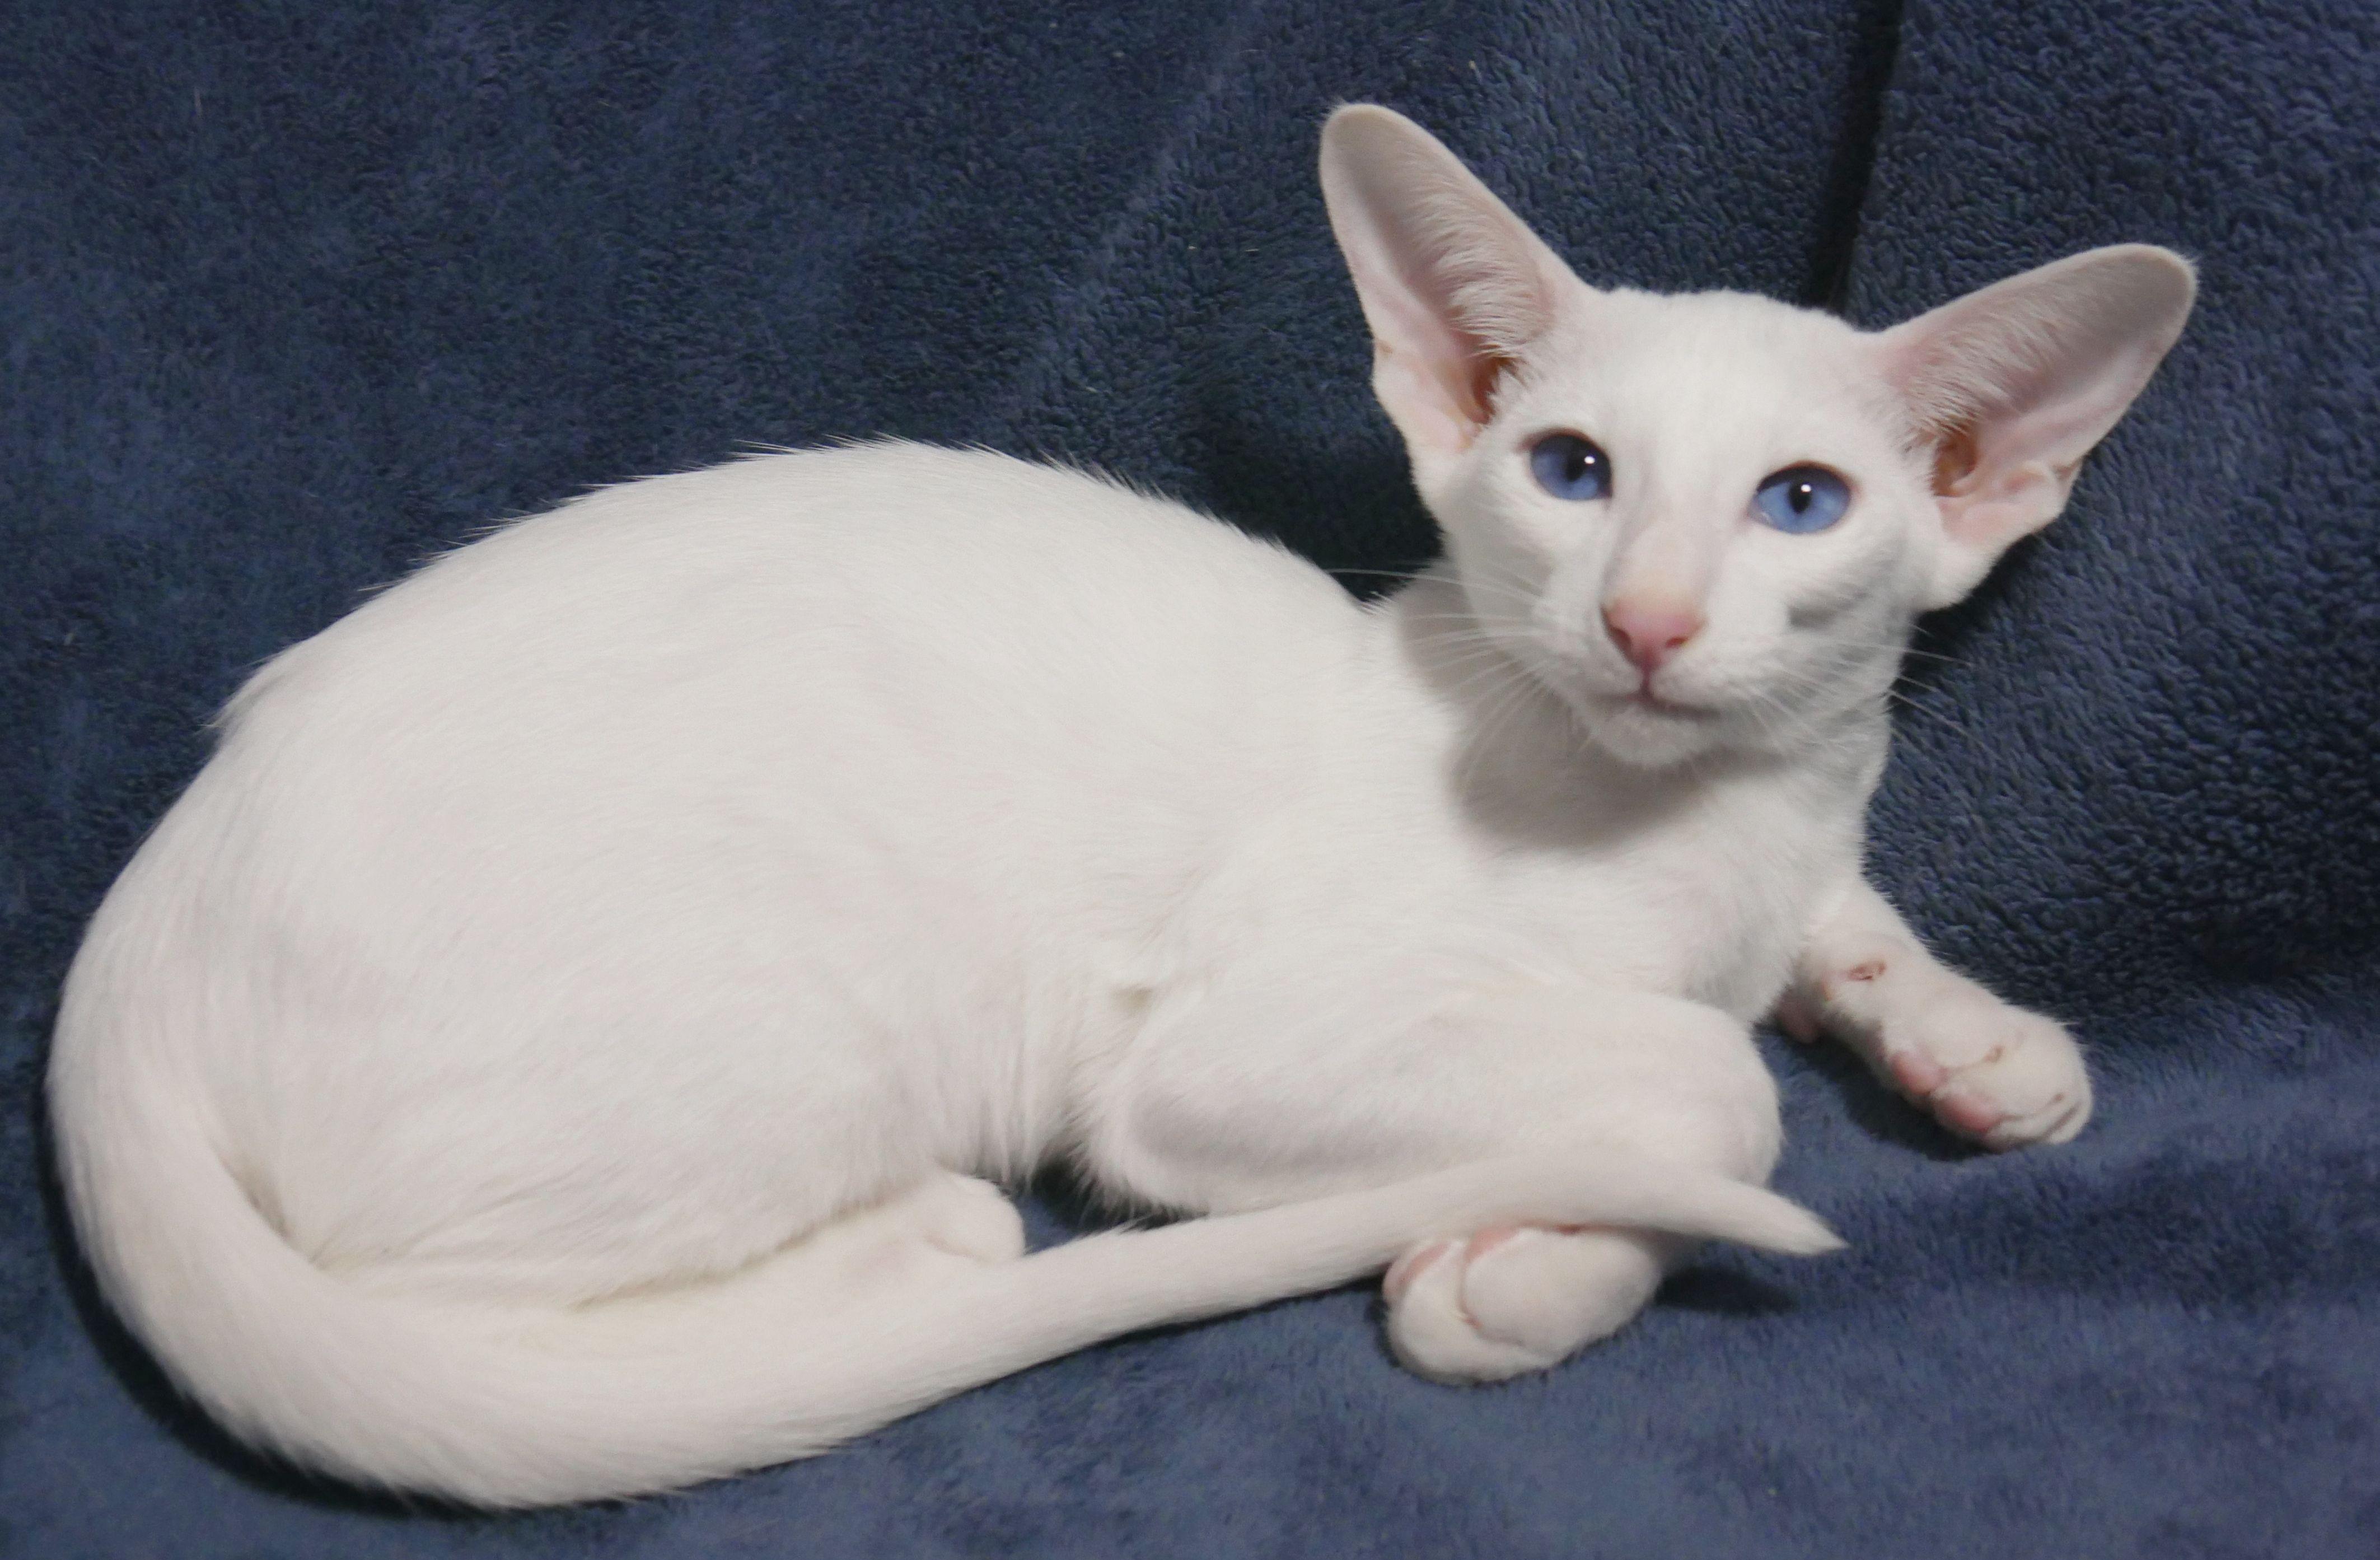 Azorez Bianca Snow Angel Blue Eyed White Oriental Shorthair Looking For A Kitten Conact Oriental Shorthair Cats Oriental Shorthair Kittens Oriental Shorthair